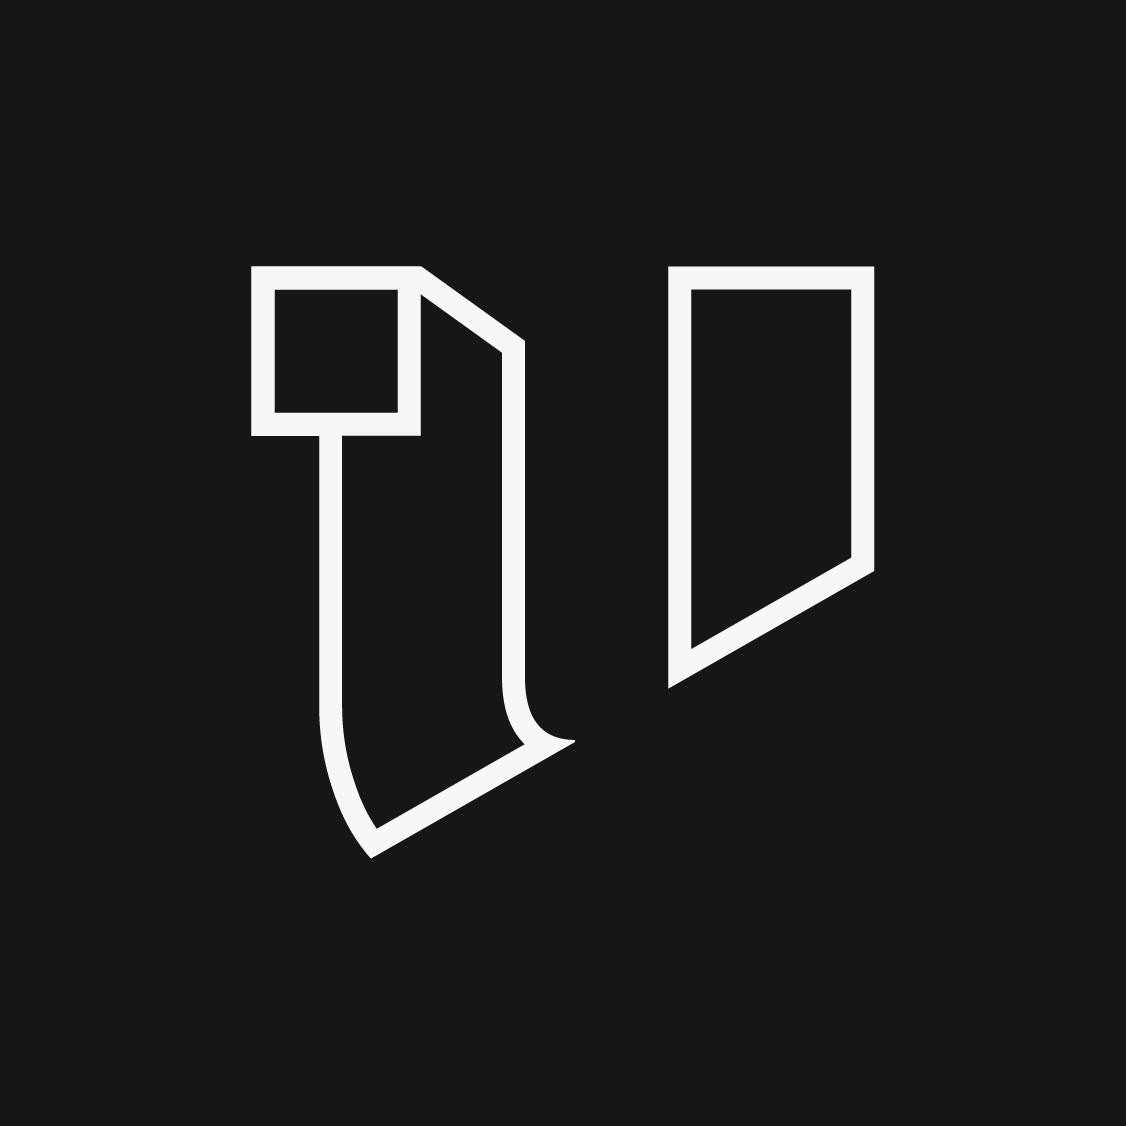 all-logos-2020-77